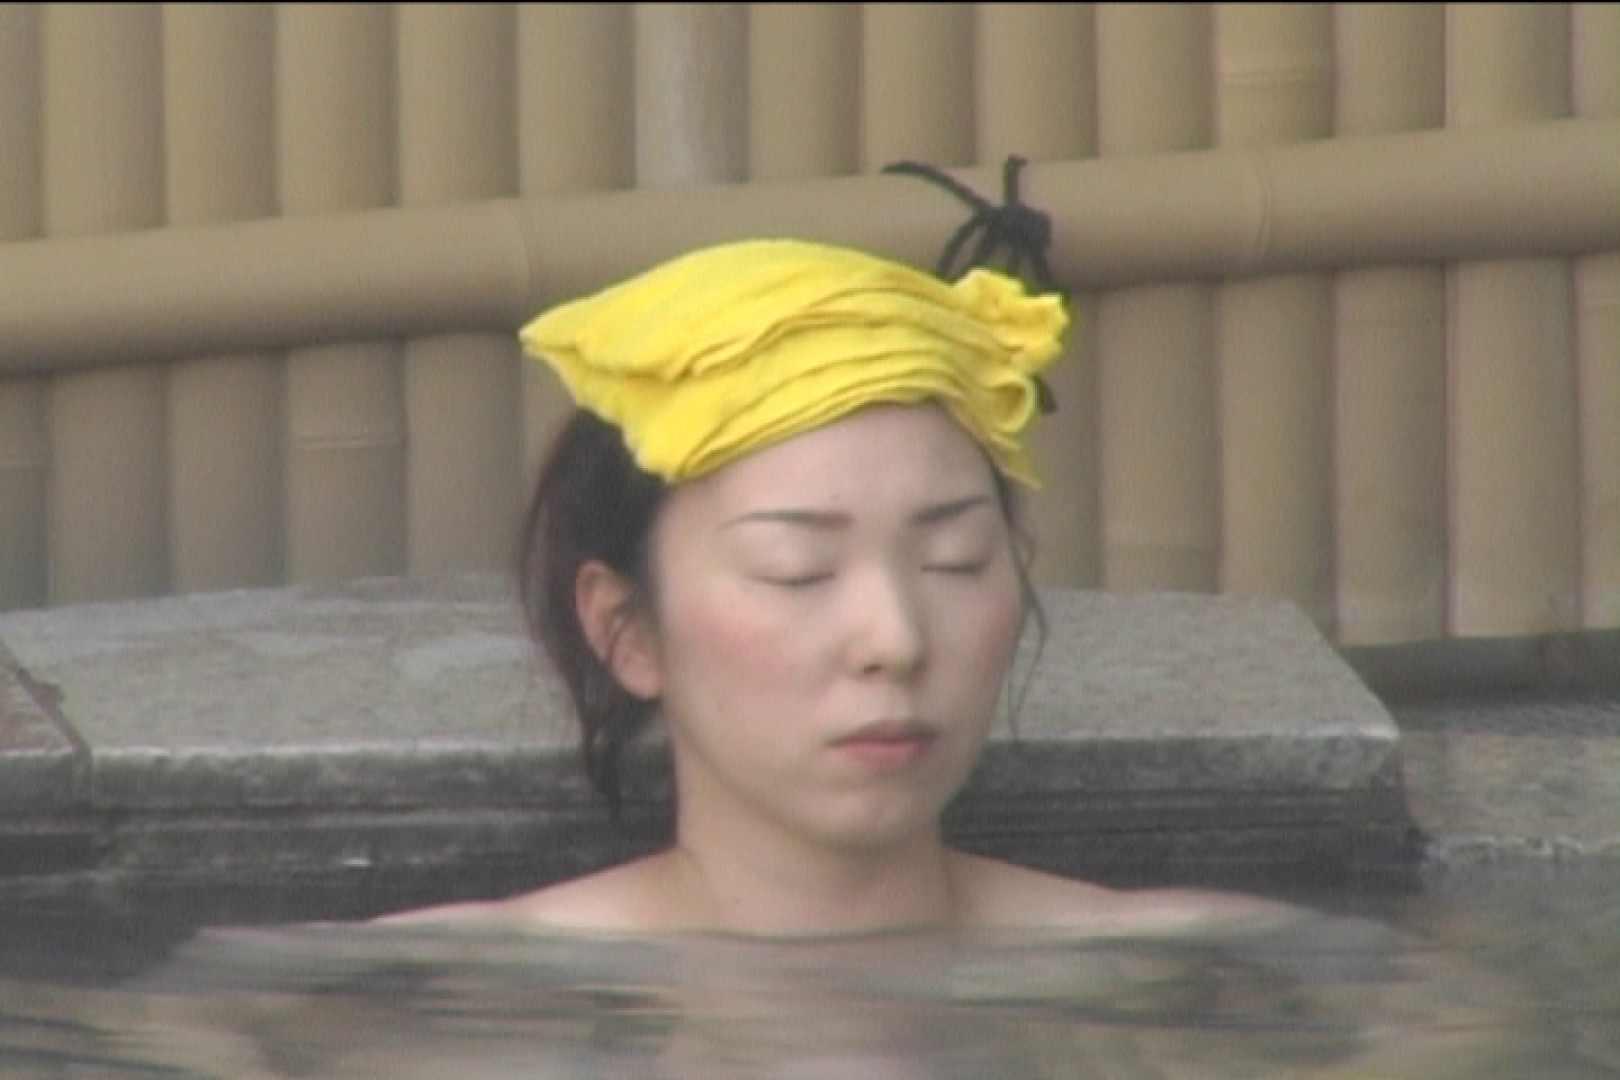 Aquaな露天風呂Vol.529 盗撮シリーズ | 露天風呂編  106PIX 43